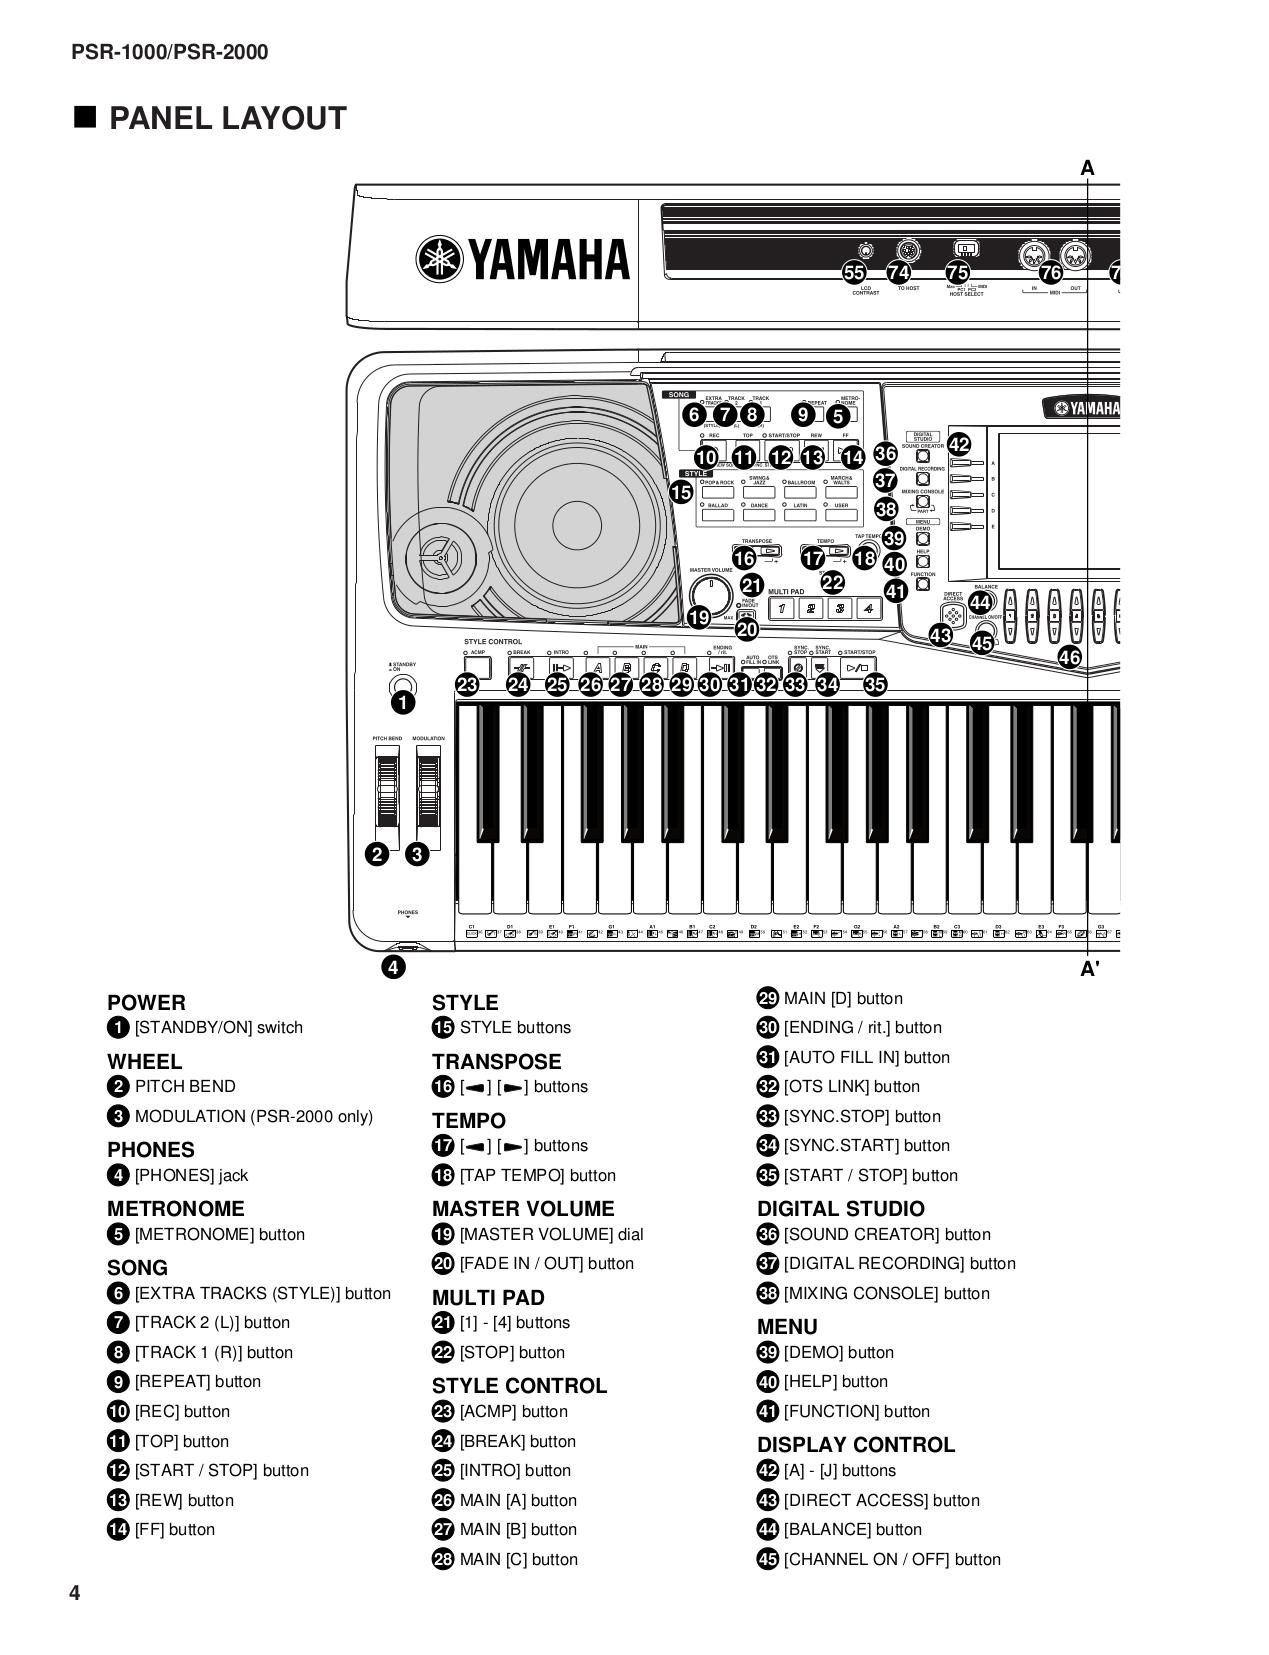 pdf manual for yamaha music keyboard cvp 206 rh umlib com Central Venous Pressure Central Venous Pressure